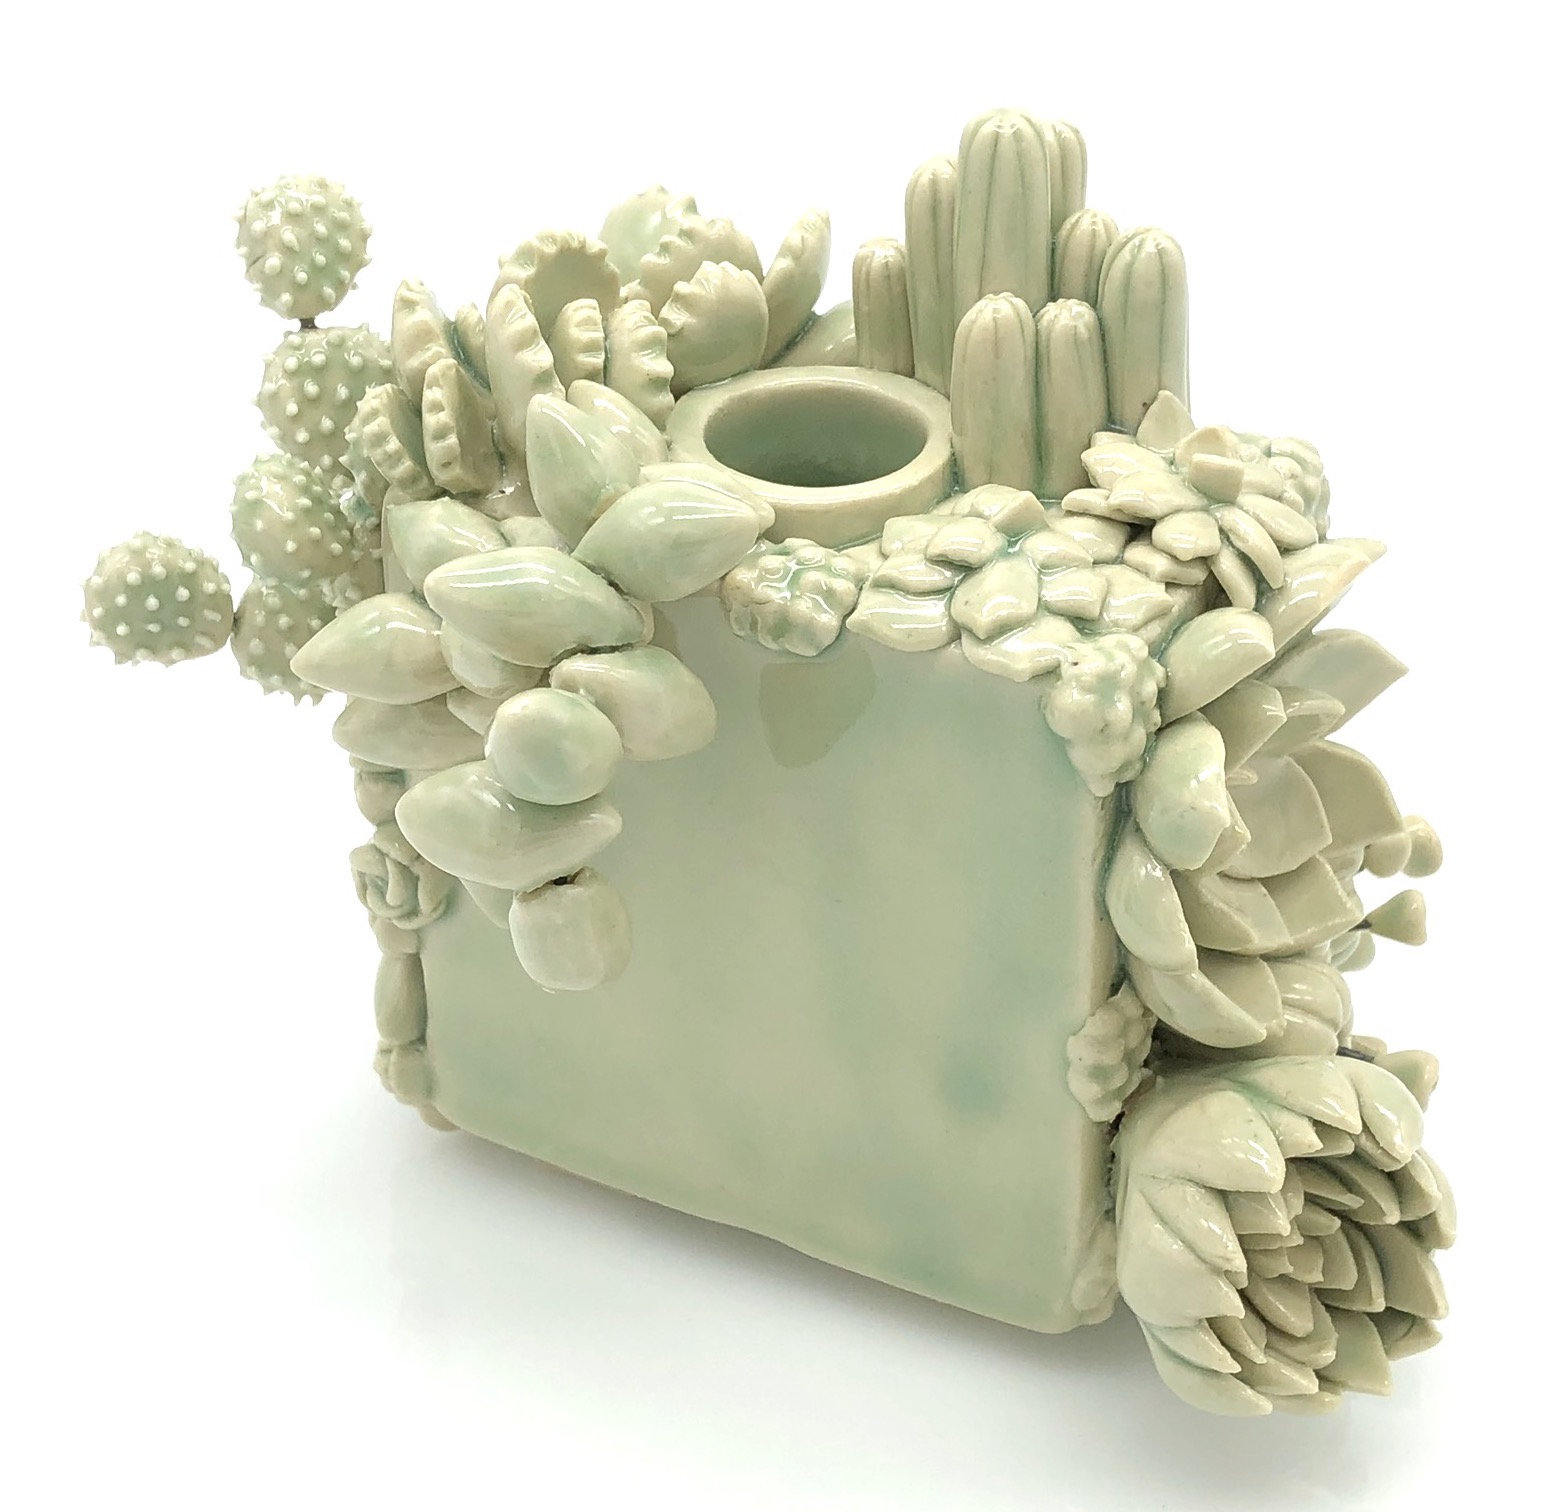 11_Square_Urn_Encrusted_in_Celadon_Succulents.JPG